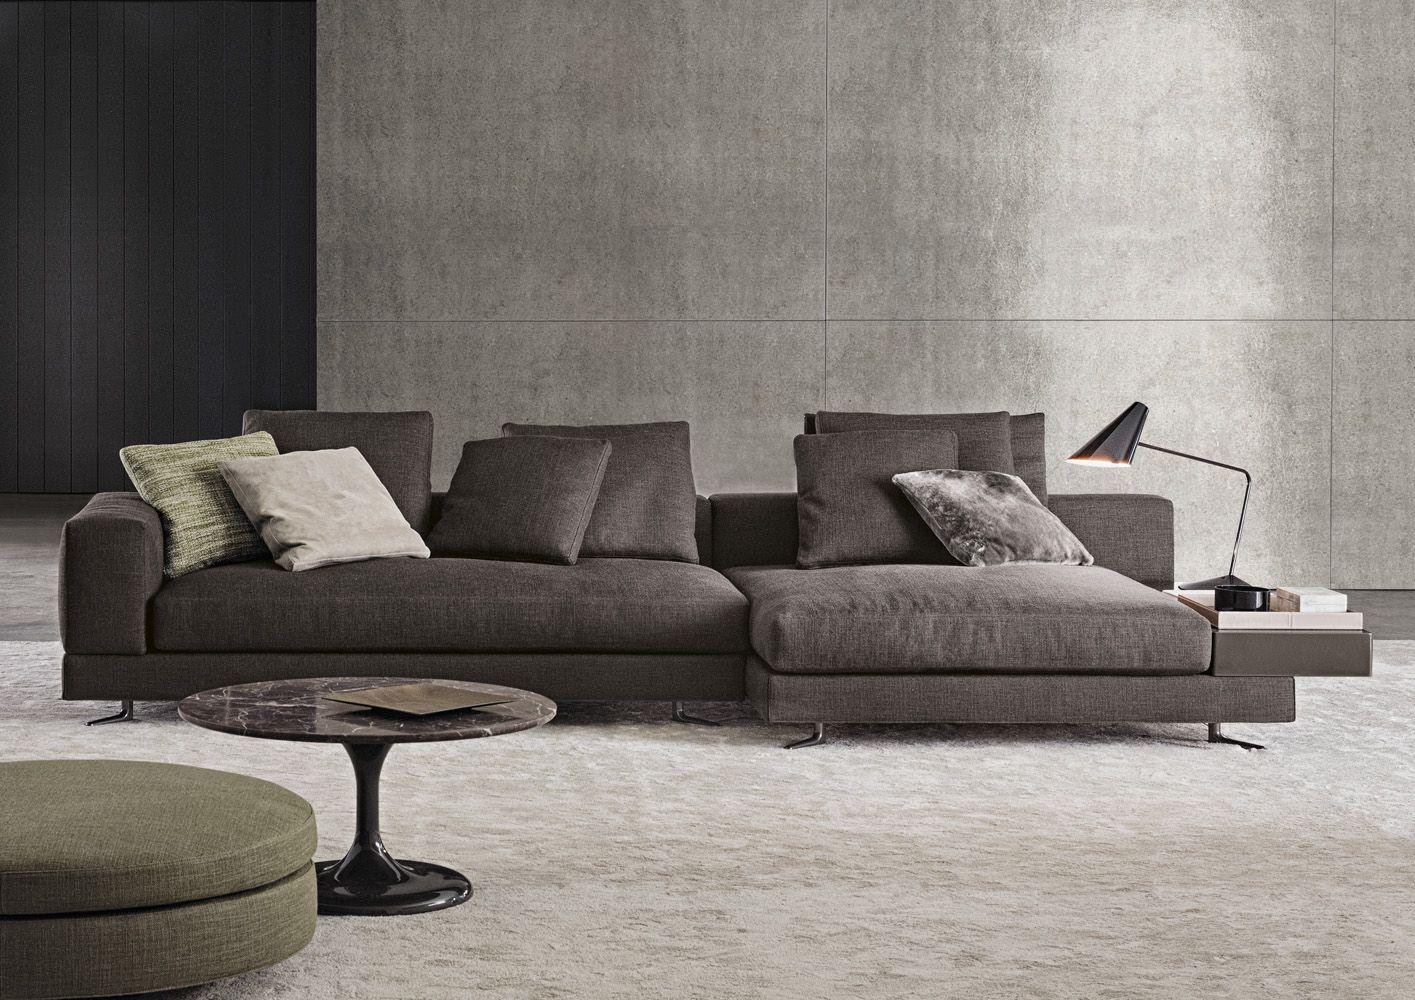 Minotti Ipad Sofas En White Sofa Design Sofa Furniture Modular Sofa